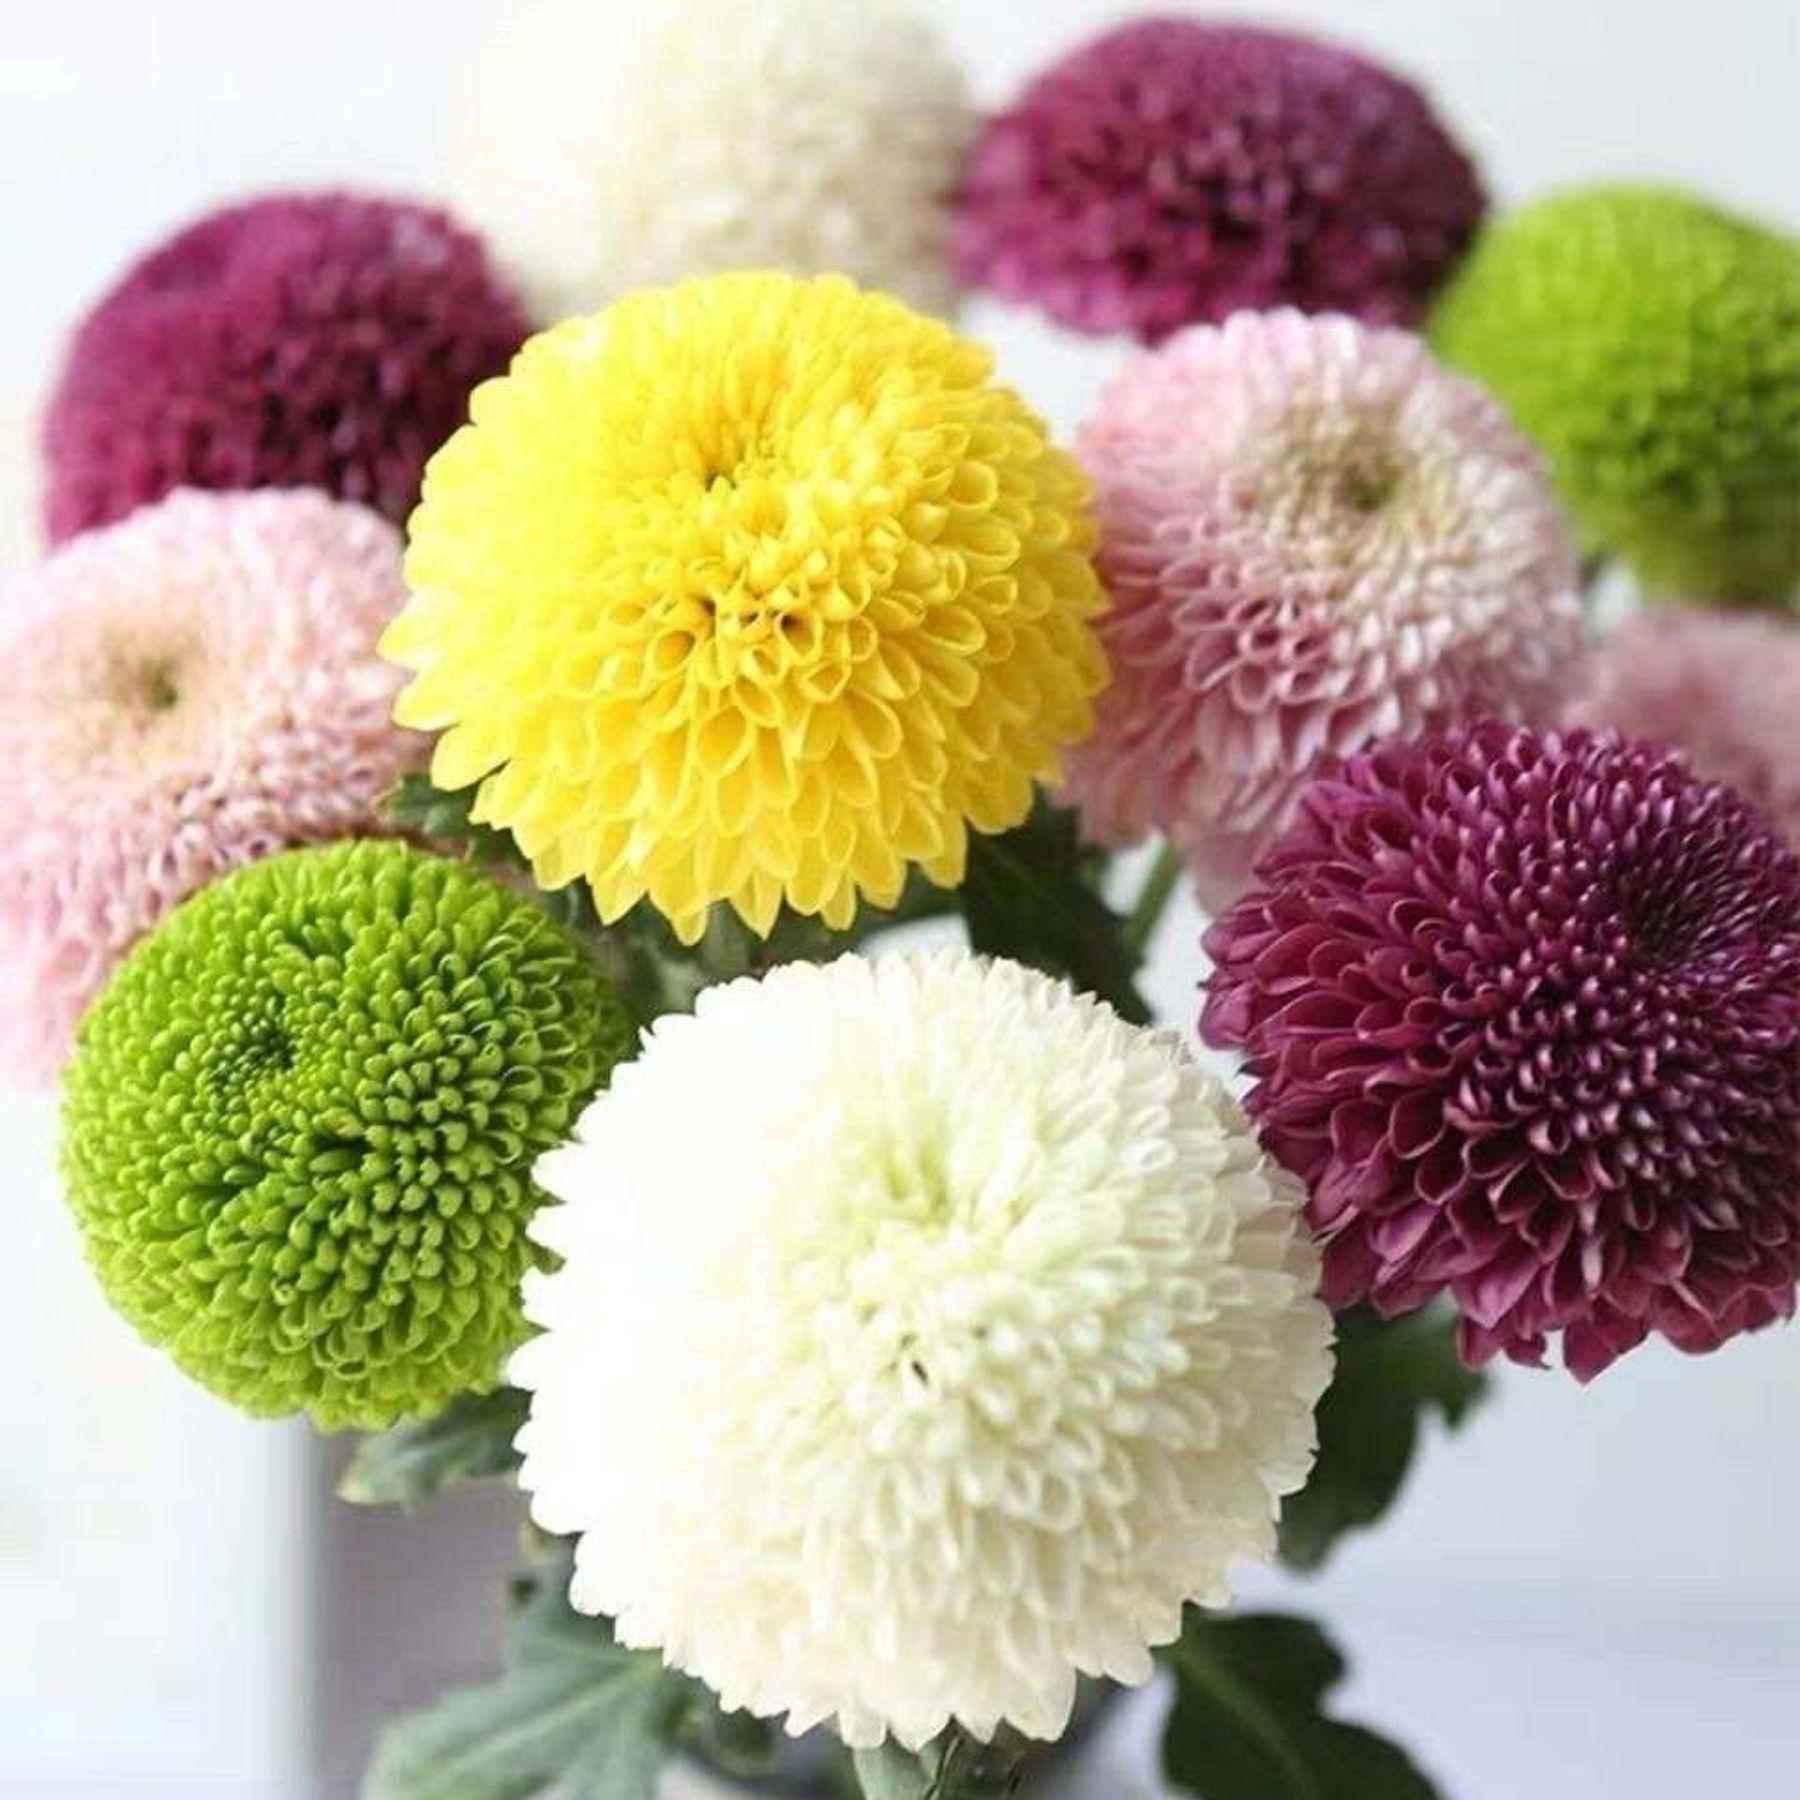 Hoa cúc pingpong